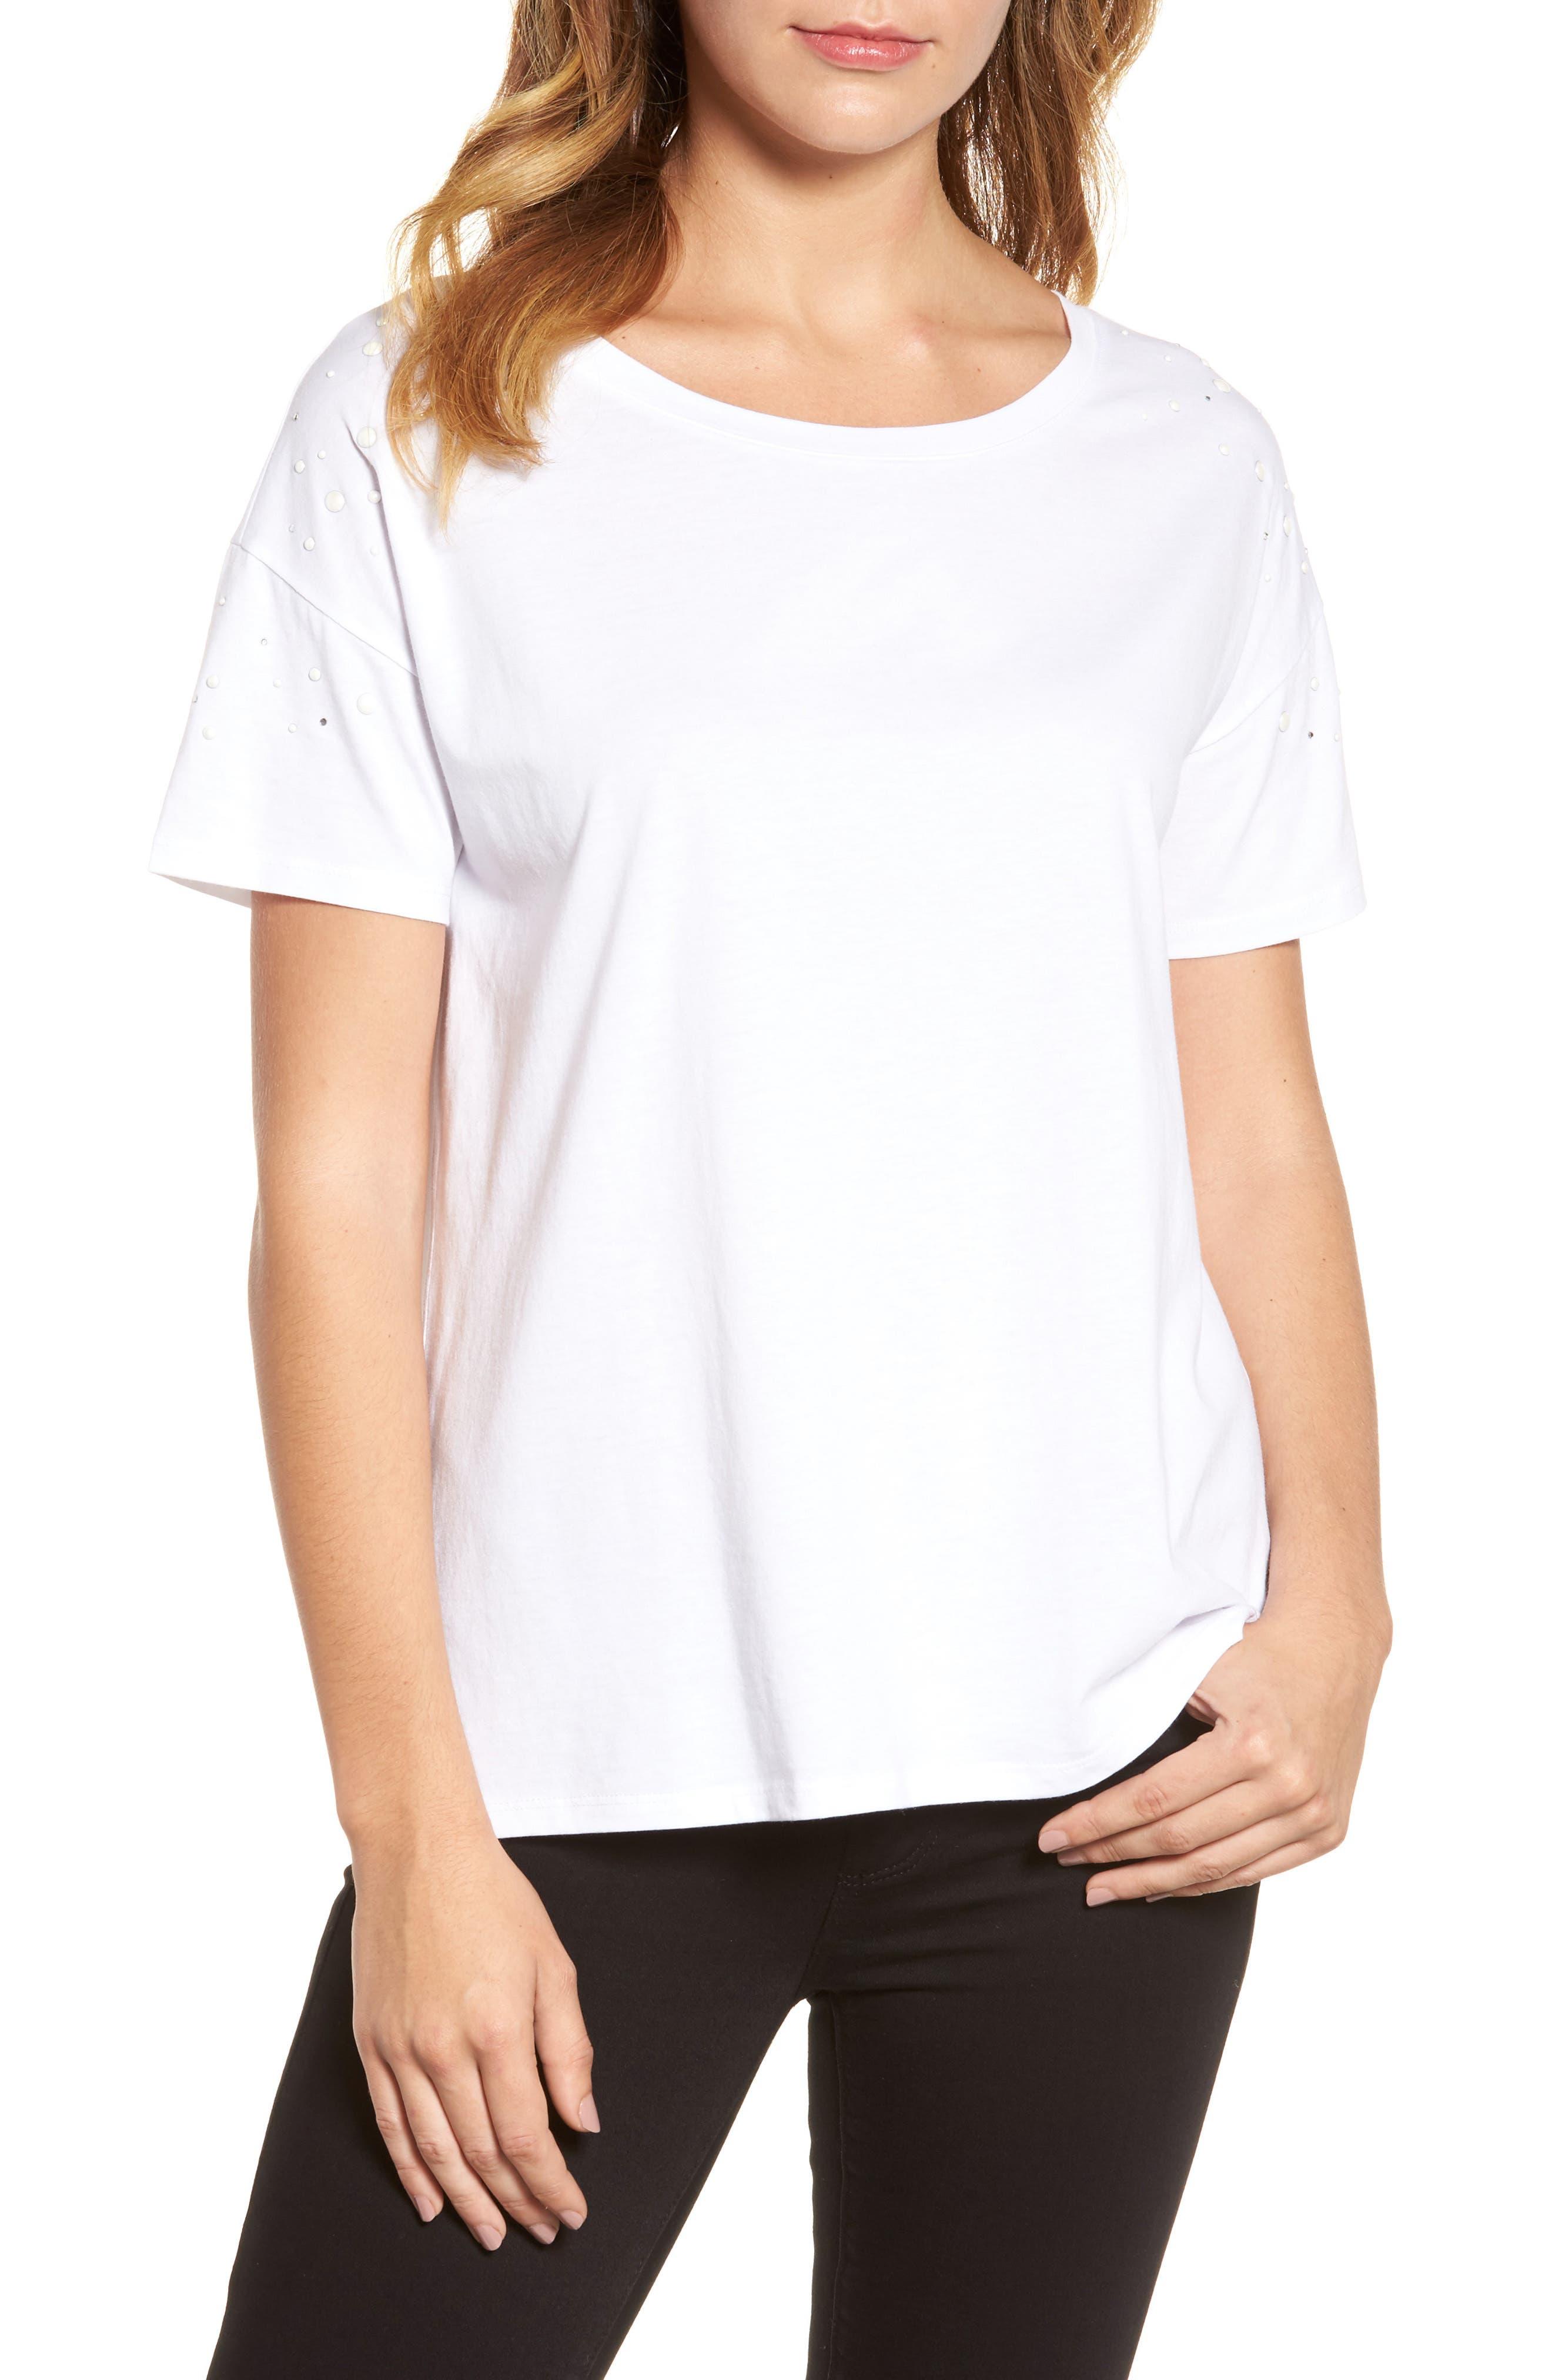 Alternate Image 1 Selected - NYDJ Short Sleeve Pearly T-Shirt